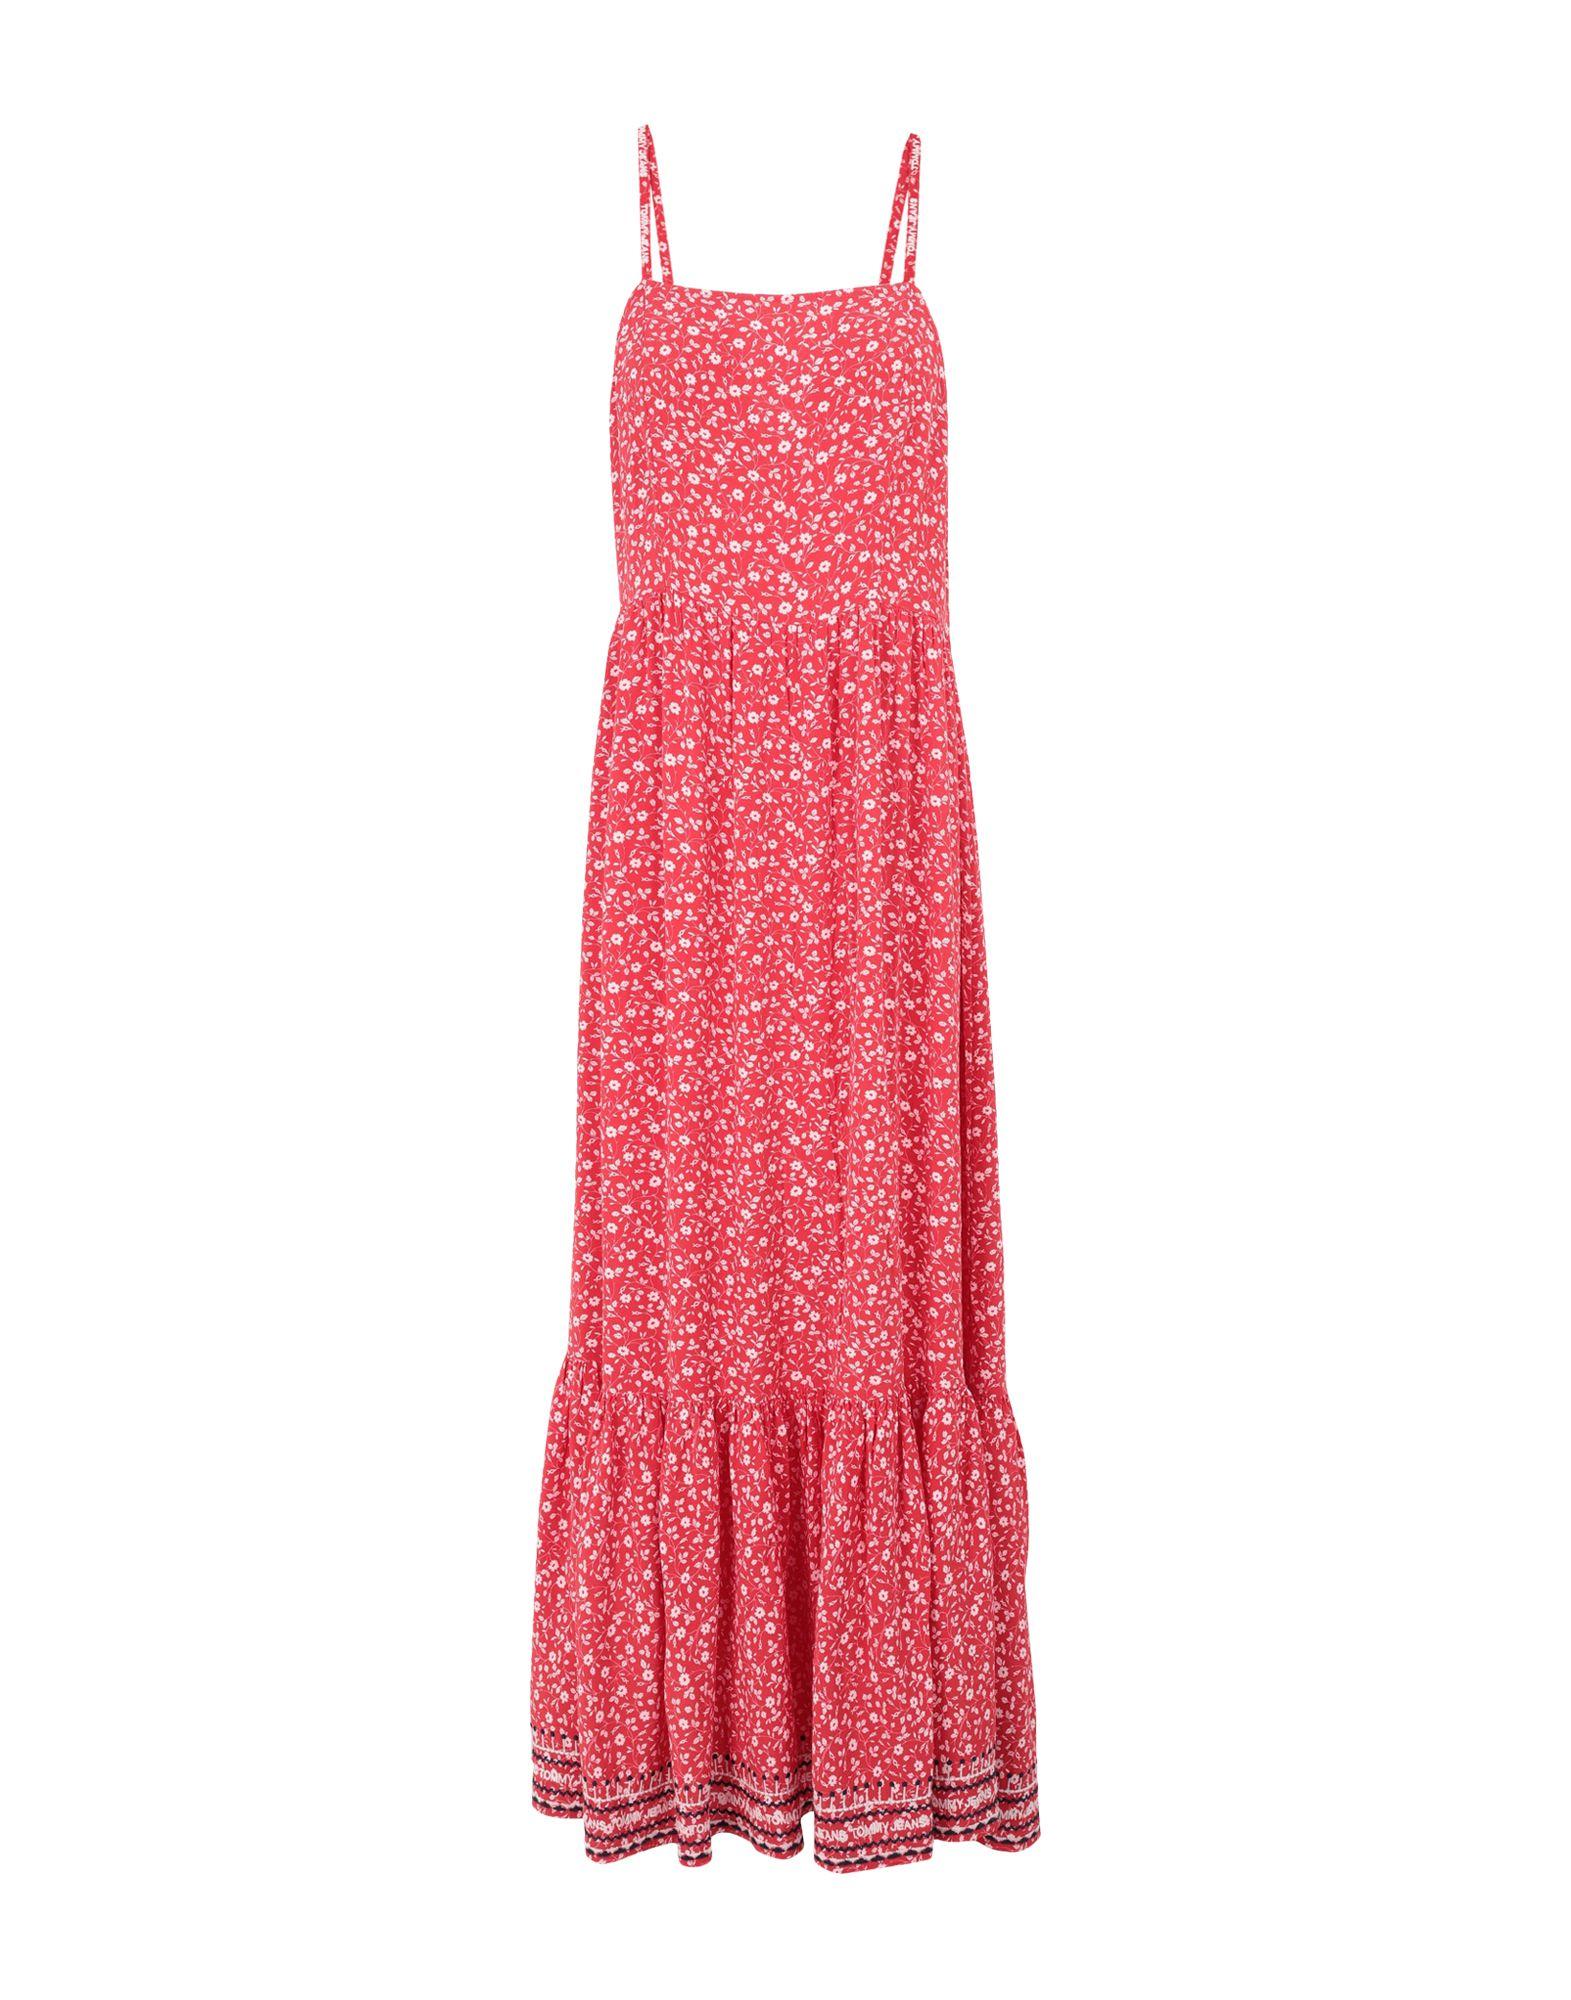 Фото - TOMMY JEANS Платье длиной 3/4 платье tommy jeans dw0dw07907 c87 twilight navy